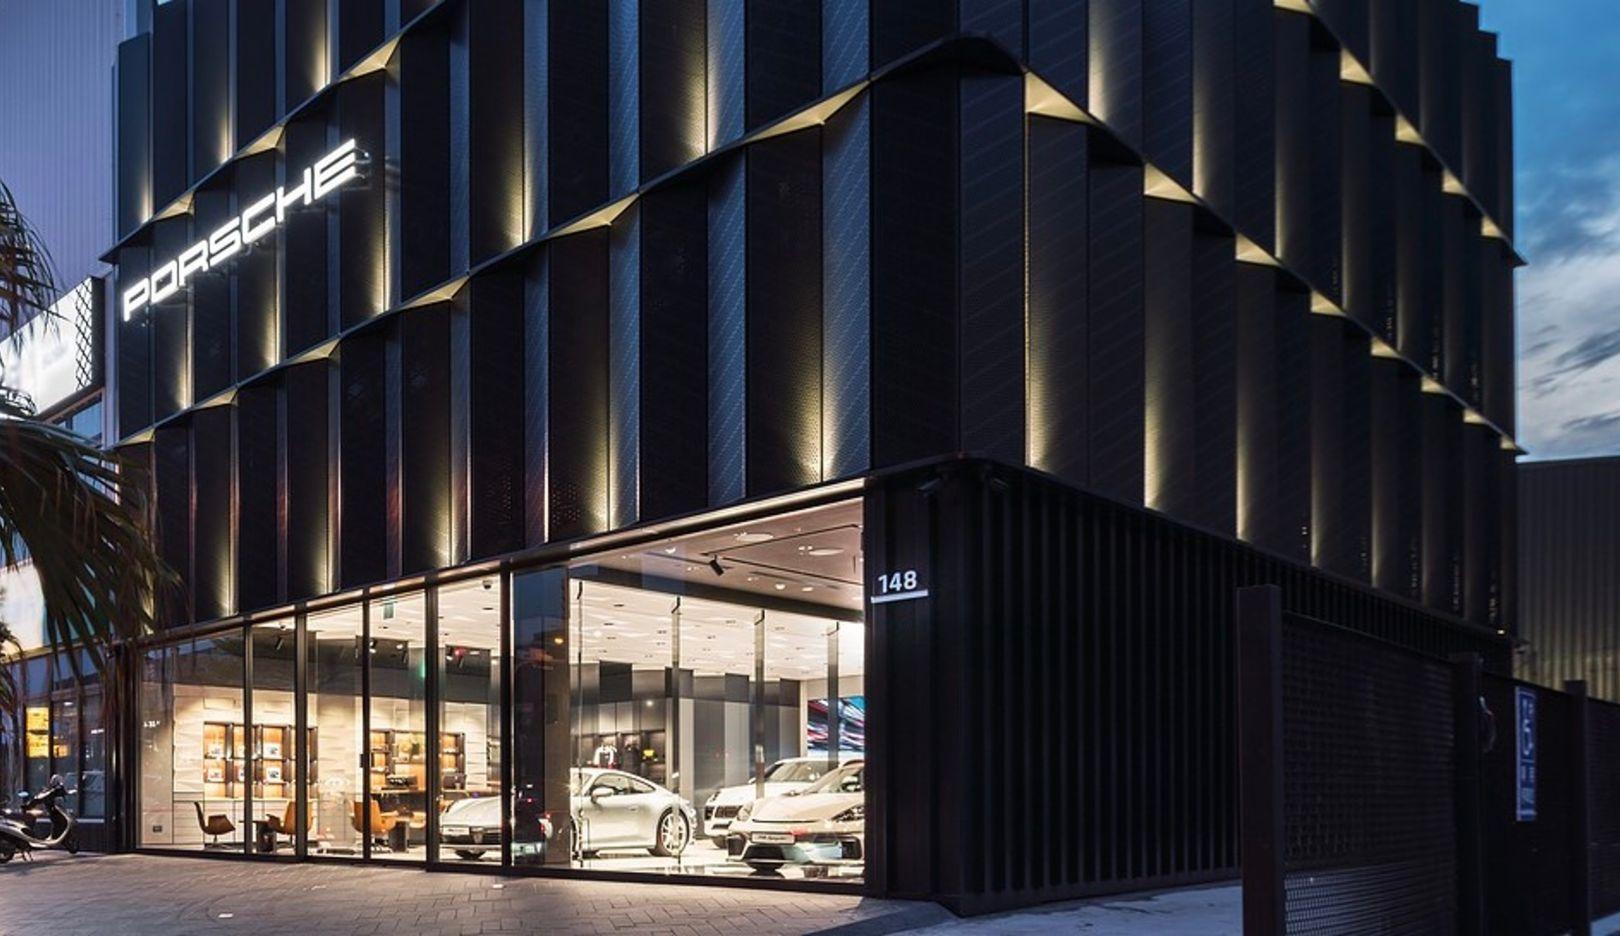 New Porsche Studio in Taiwan - Image 4